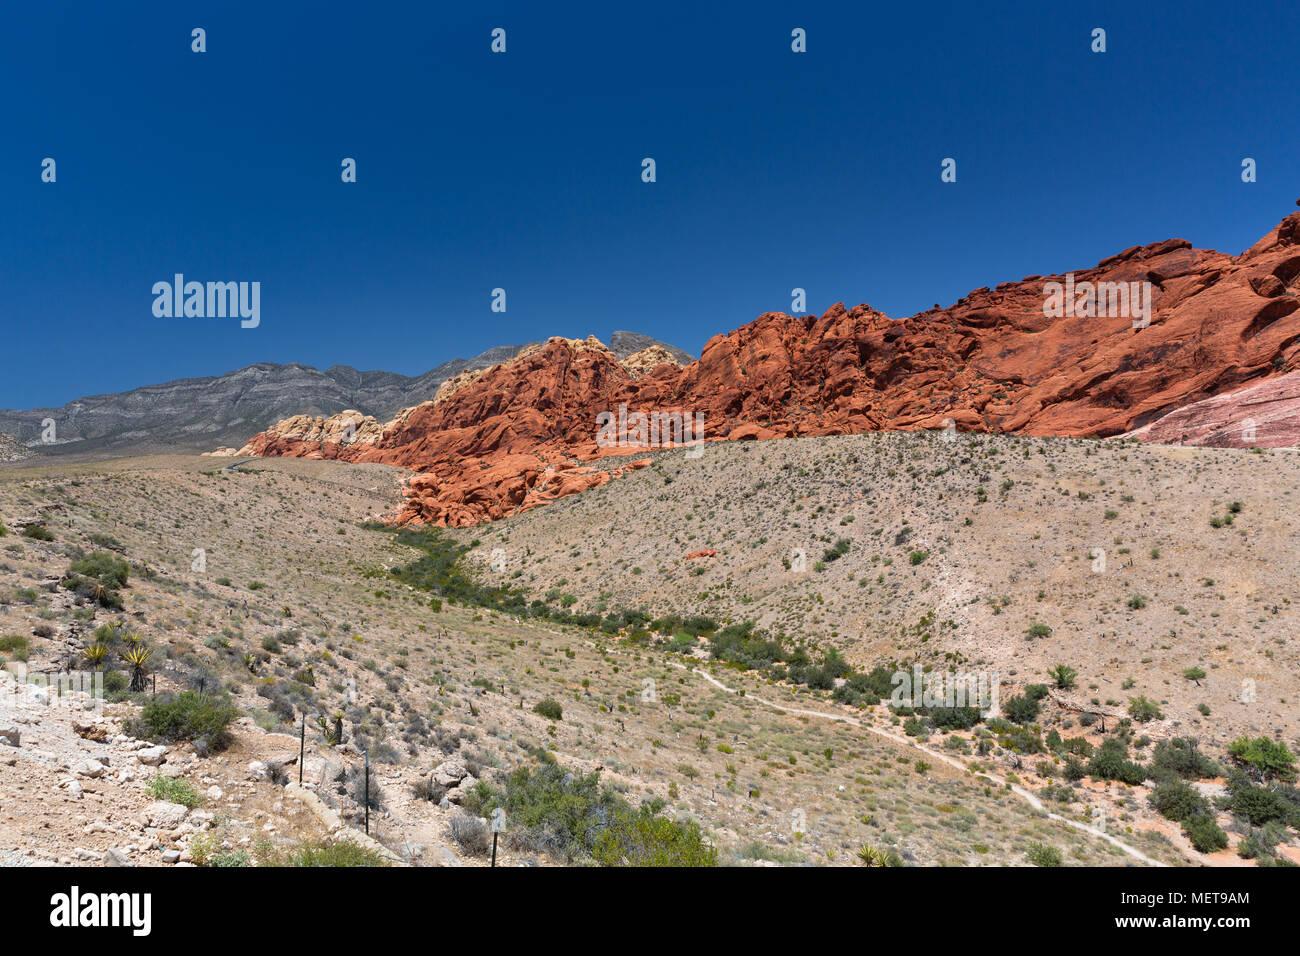 Red Rock Canyon gegen ein strahlend blauer Himmel - Las Vegas, Nevada Stockbild